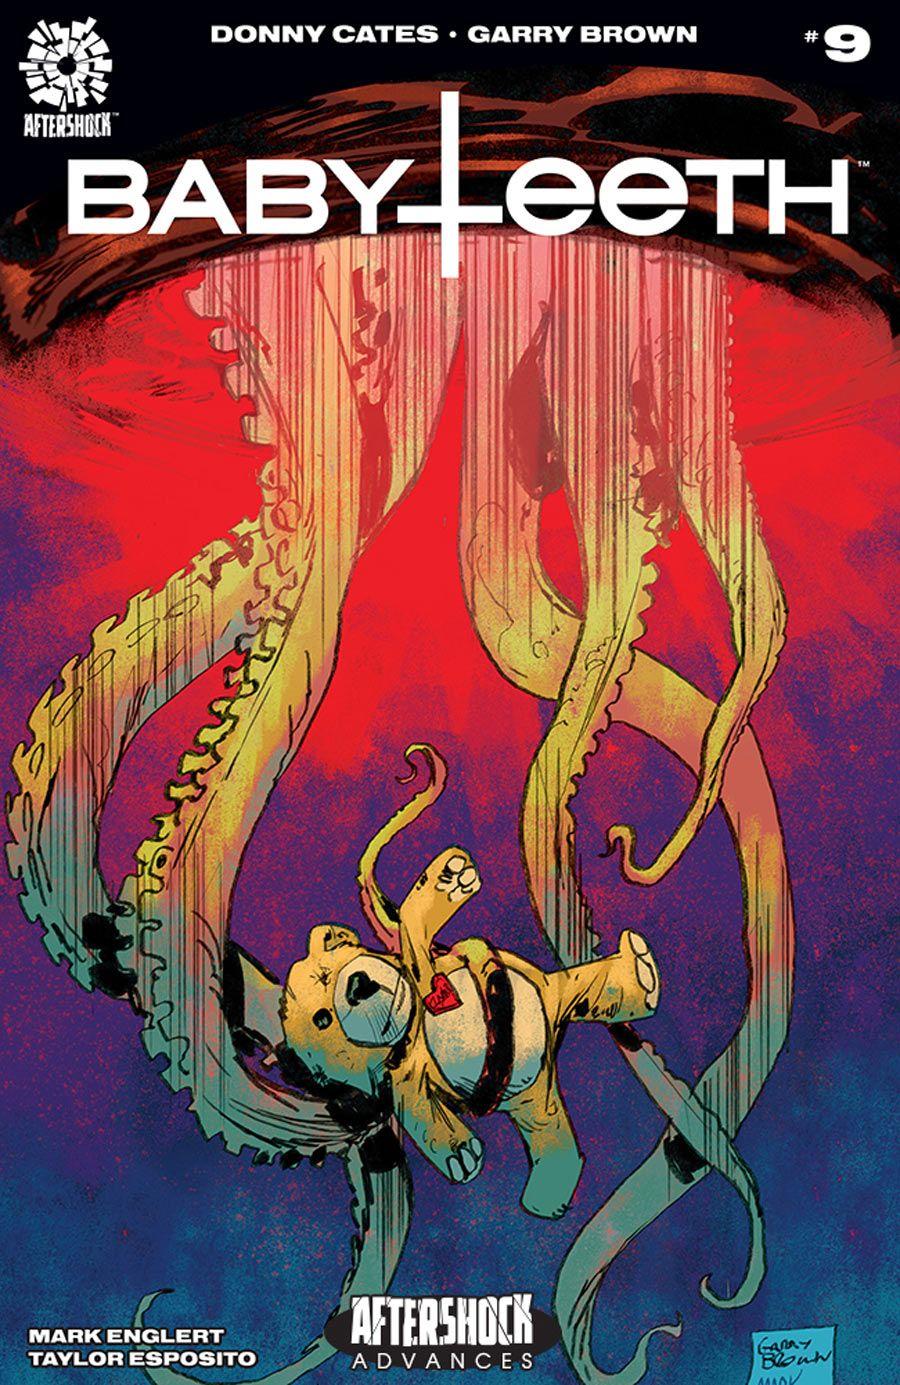 EXCLUSIVE: Babyteeth #9 by Donny Cates & Garry Brown   CBR